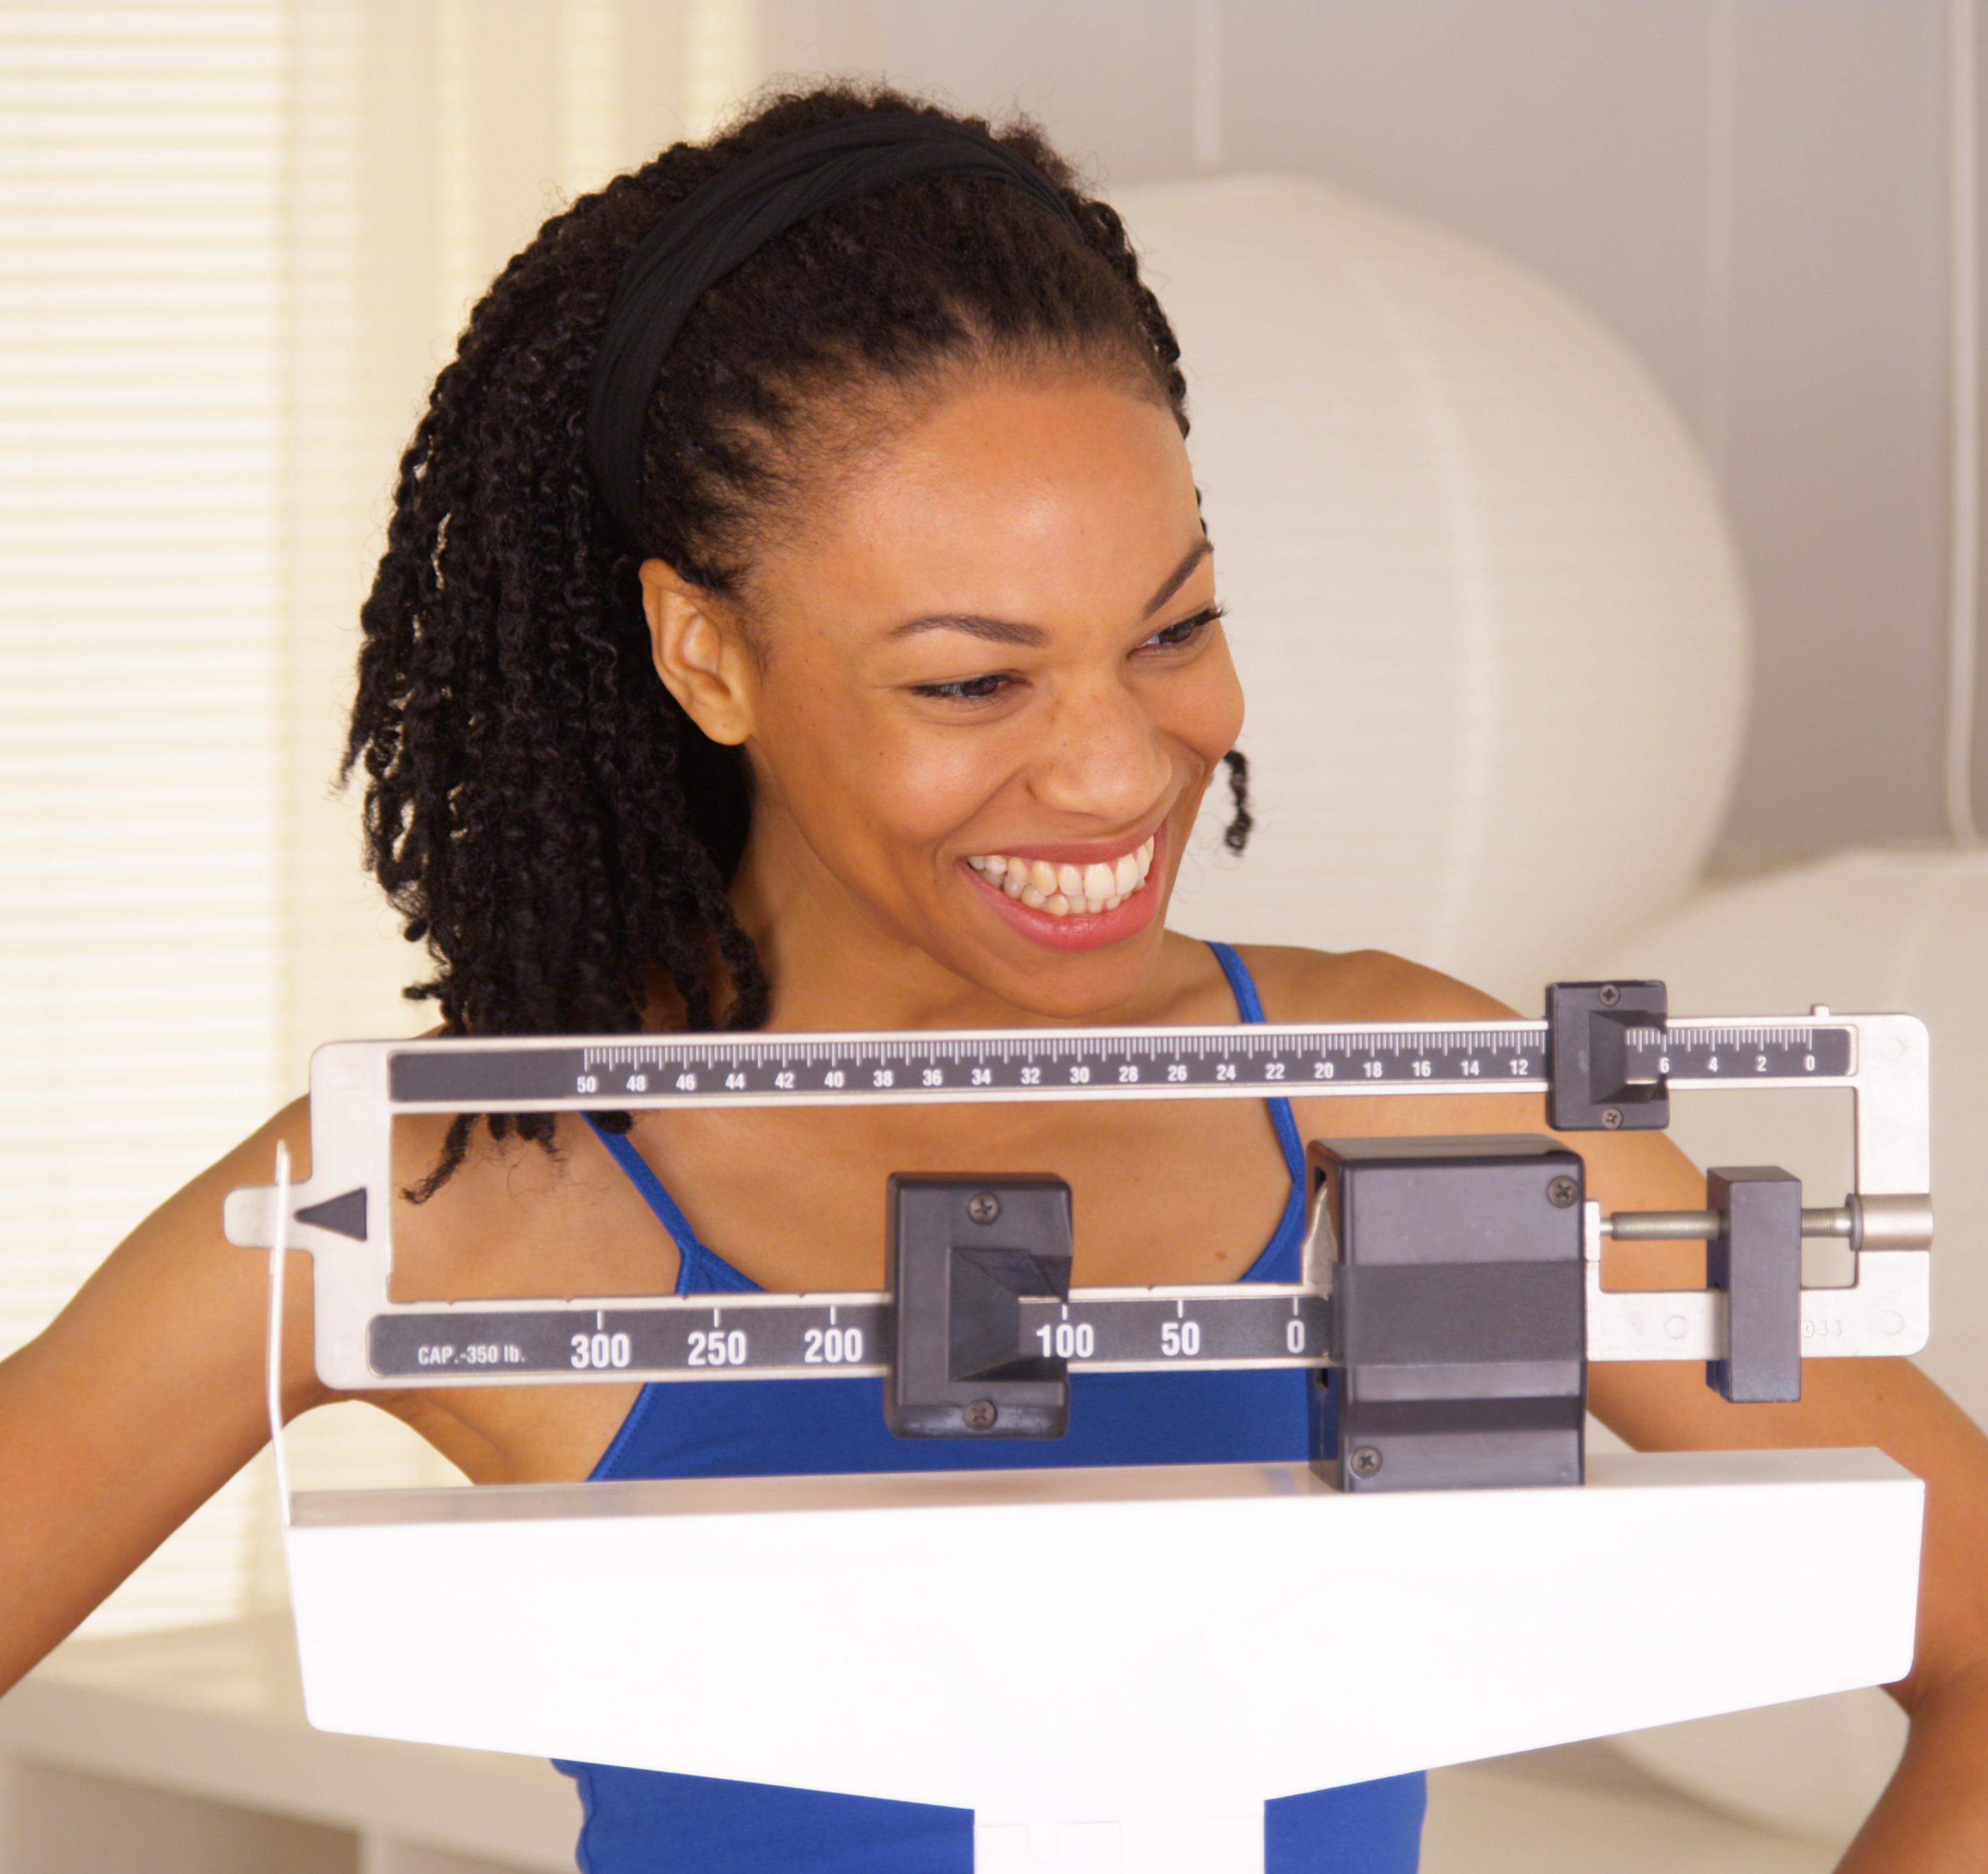 Weight Loss Program in St. Paul, MN